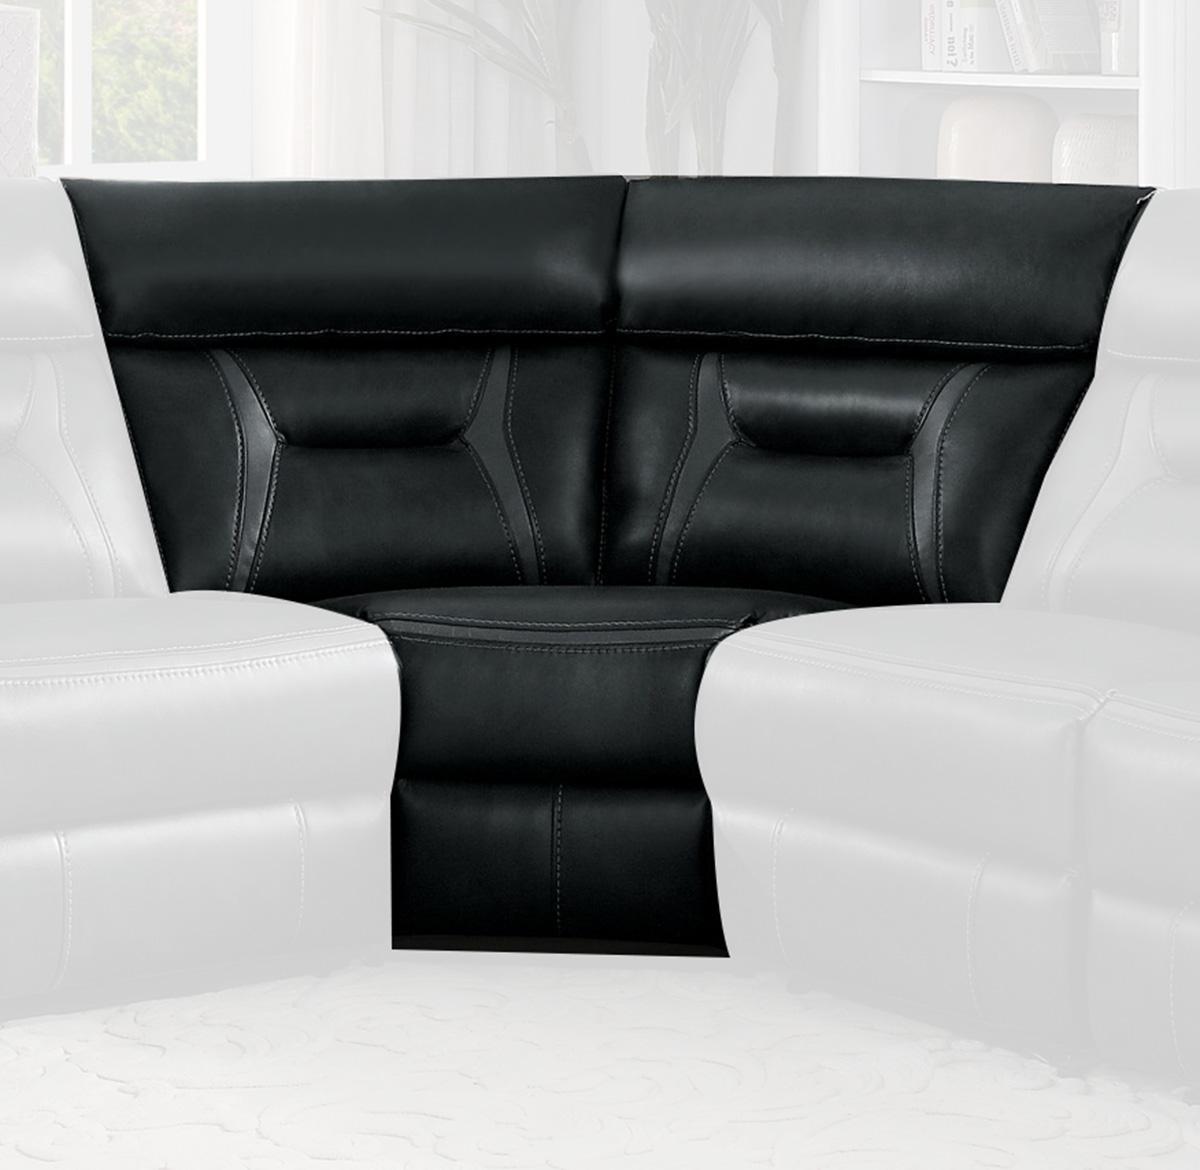 Homelegance Amite Corner Seat - Dark Gray